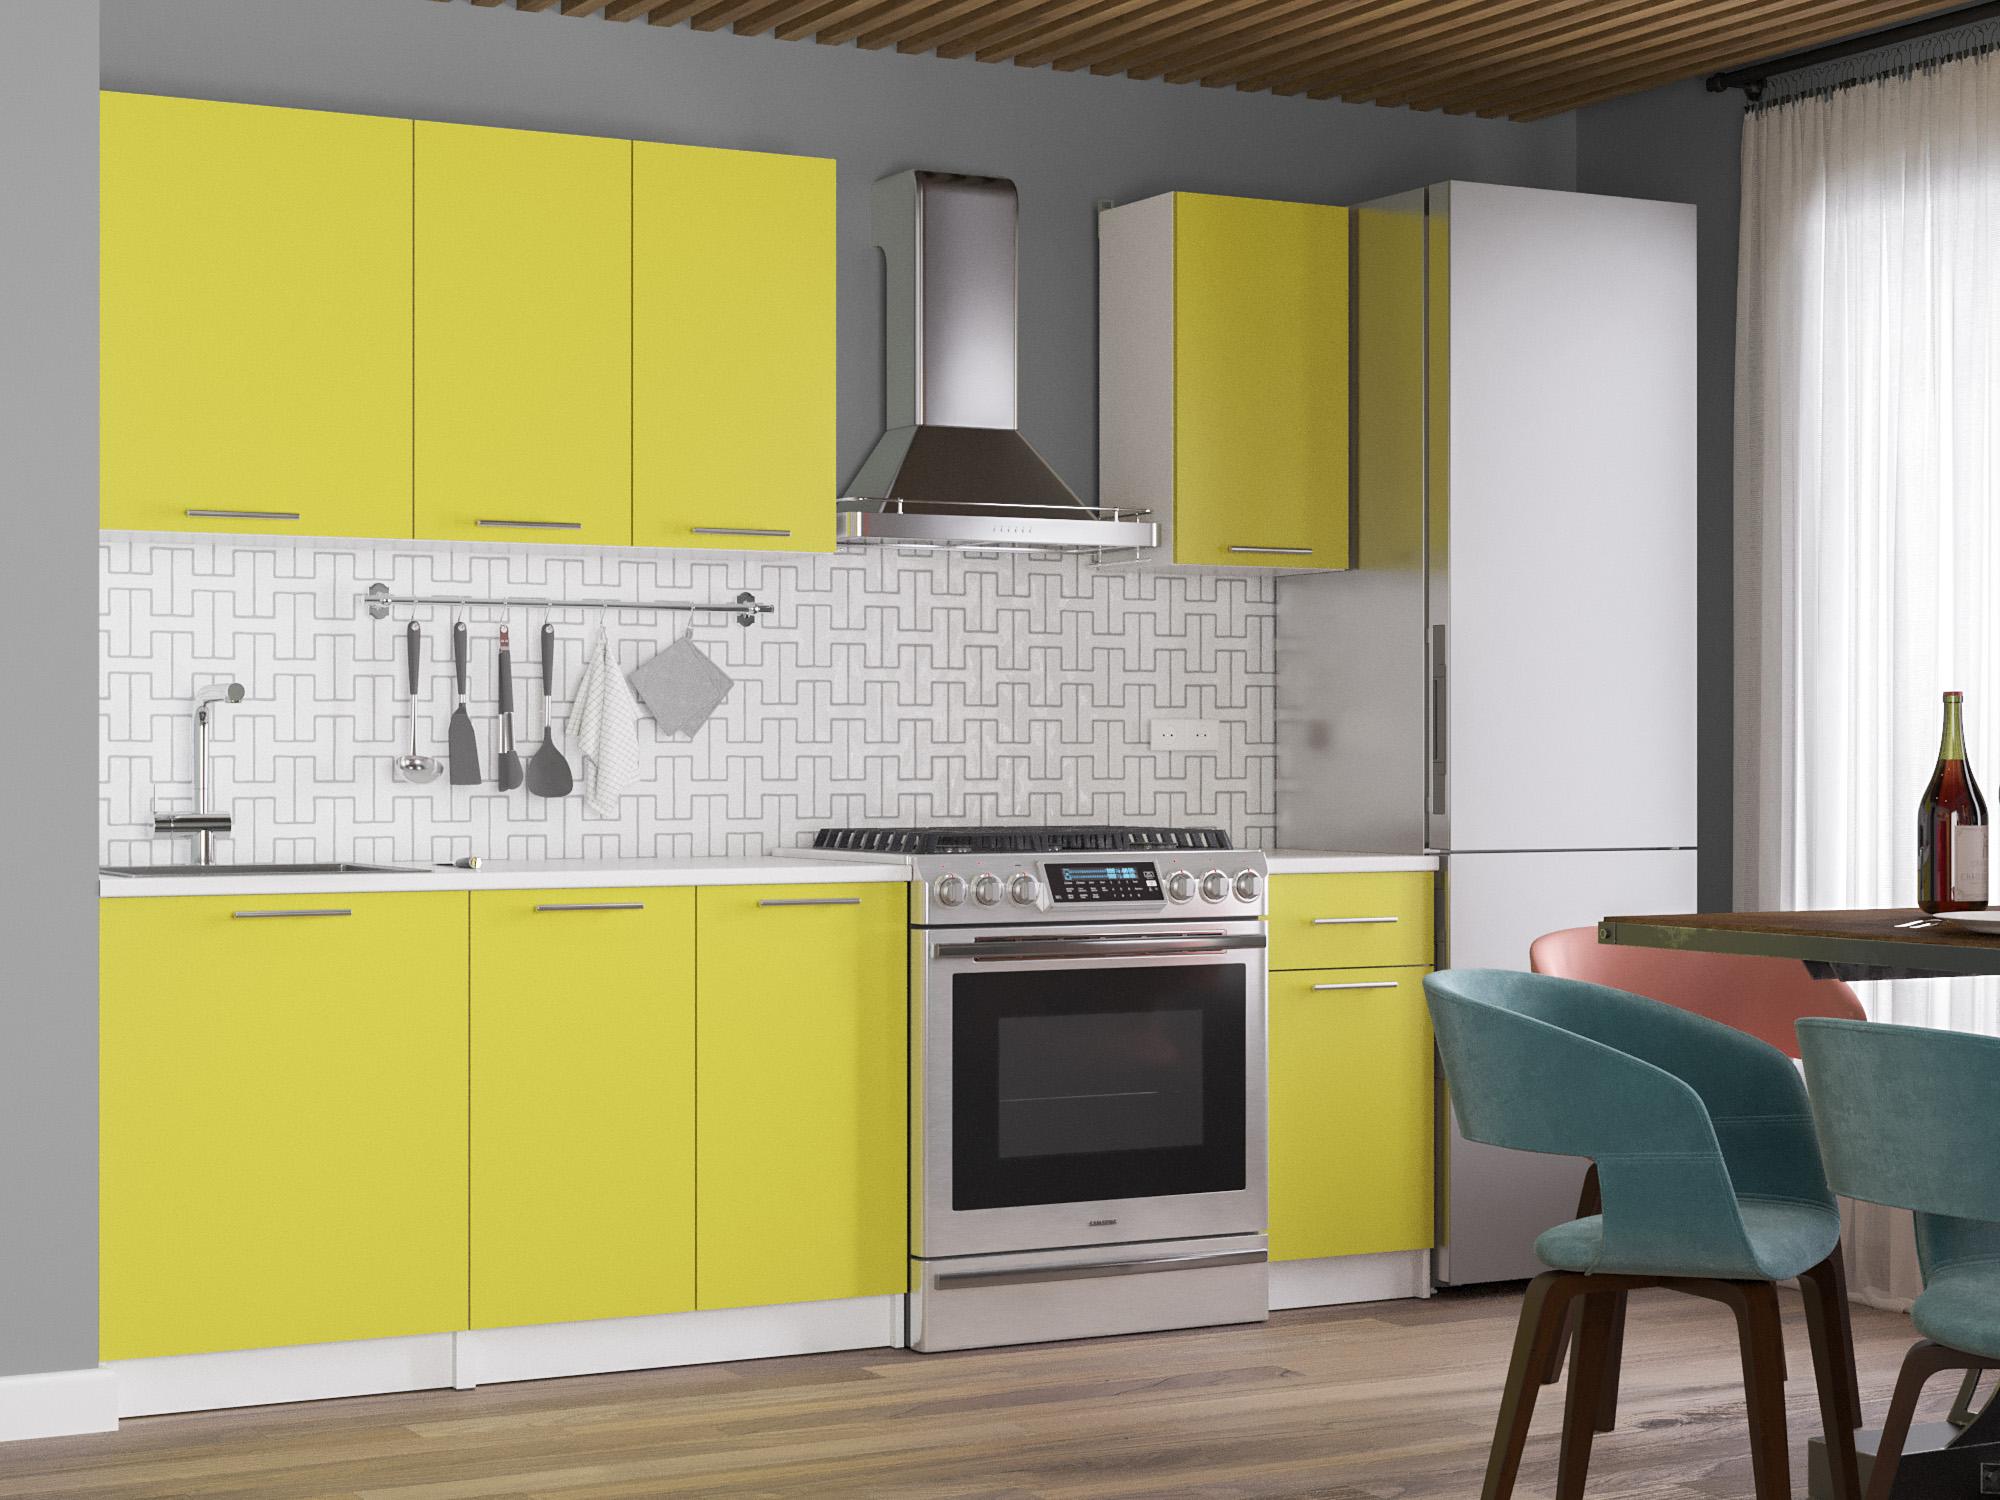 Кухня Лион 1,8 Желтый, , Белый, ЛДСП Белый, Желтый